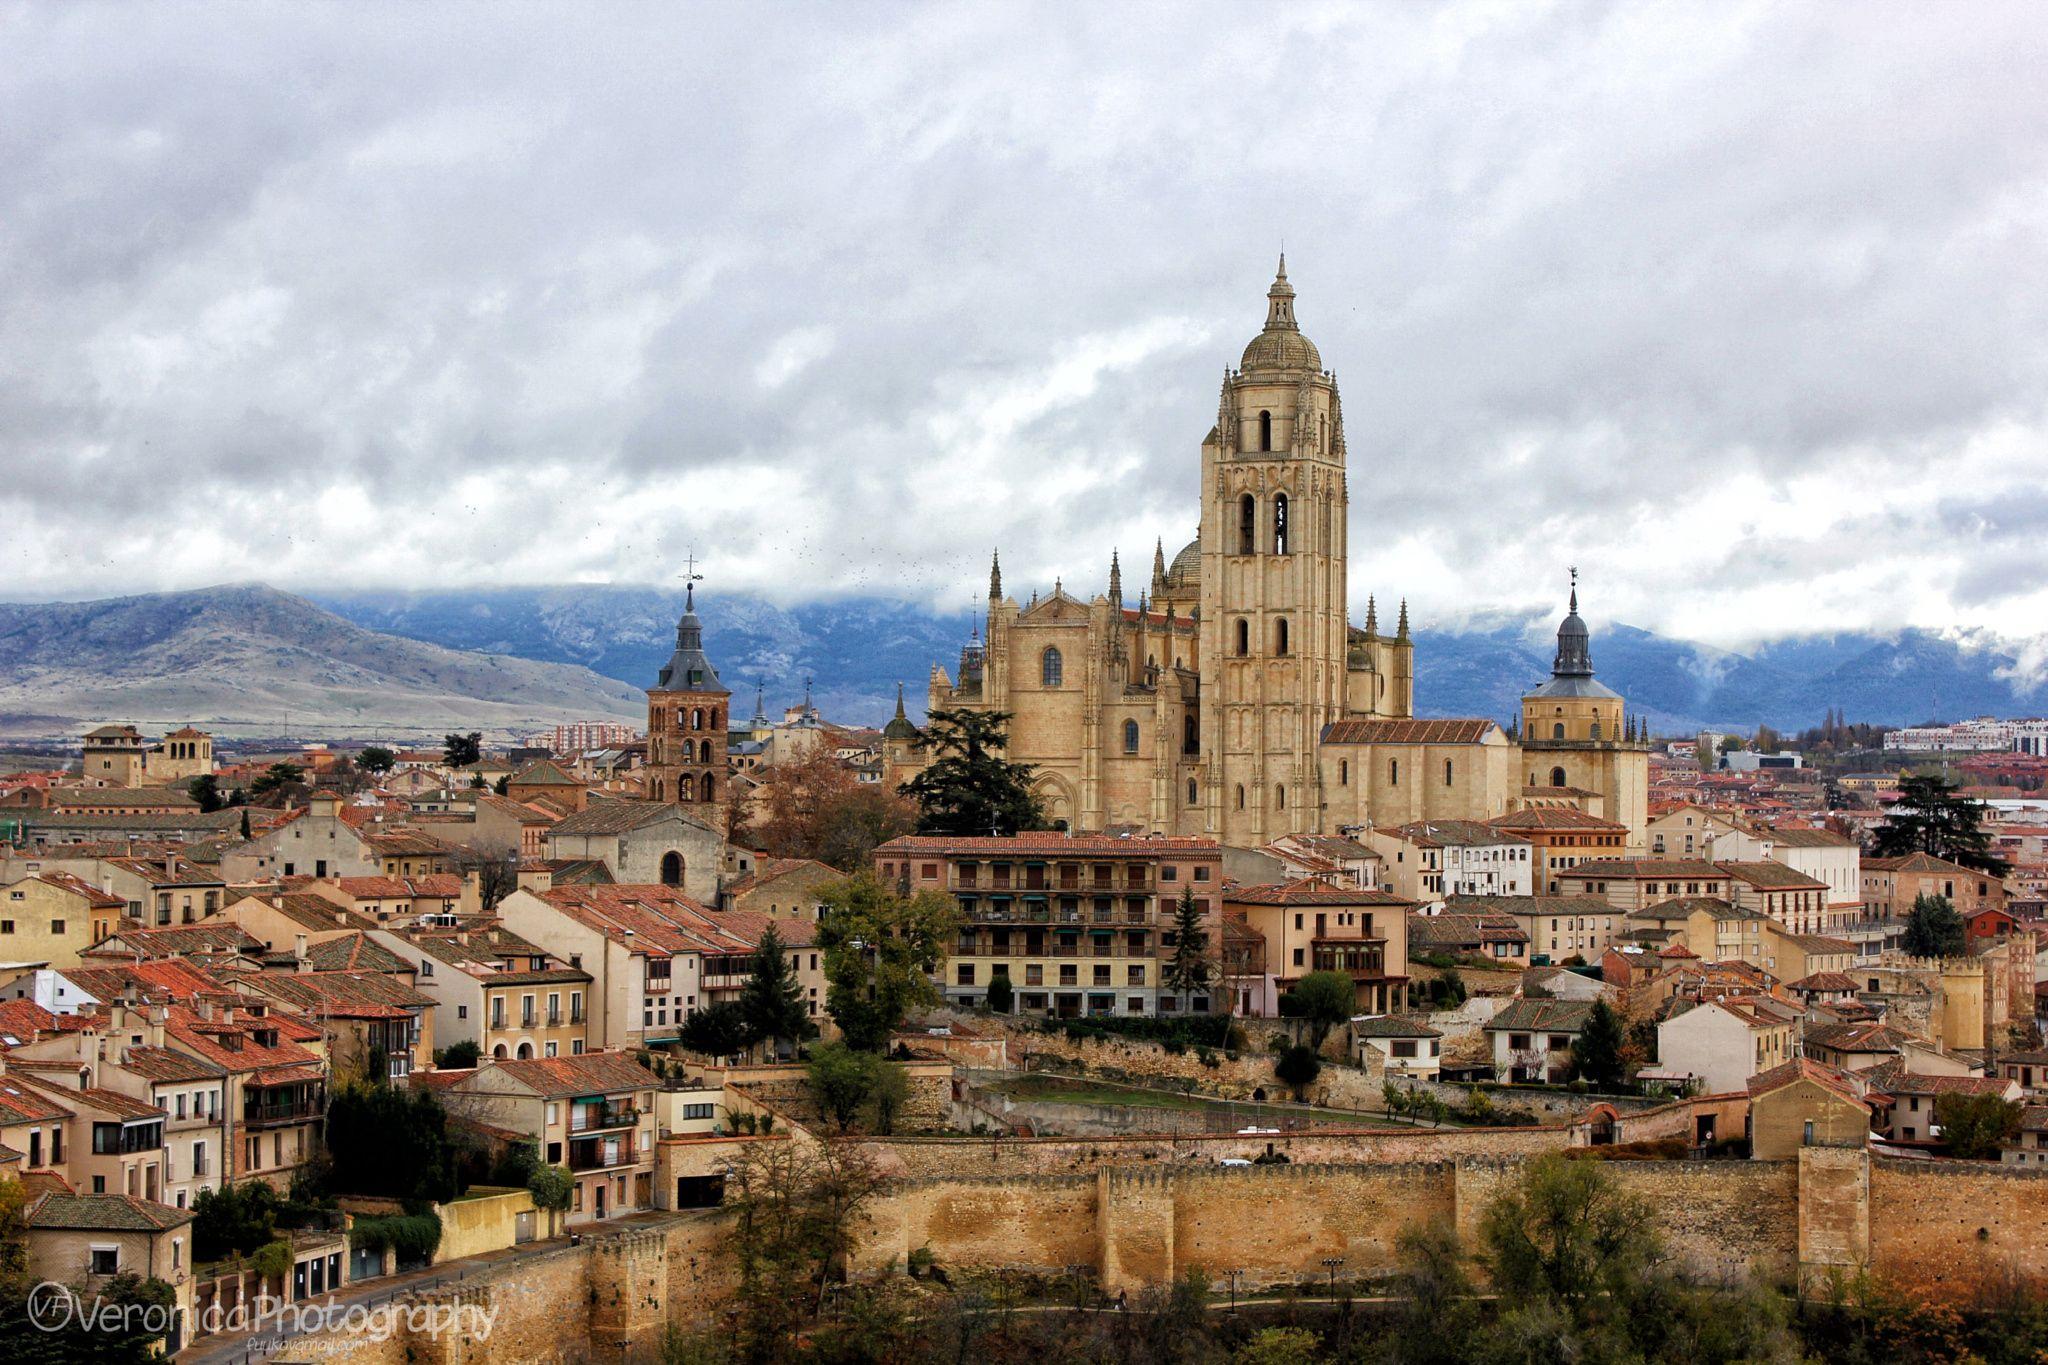 Segovia - Veronica [베로니카]